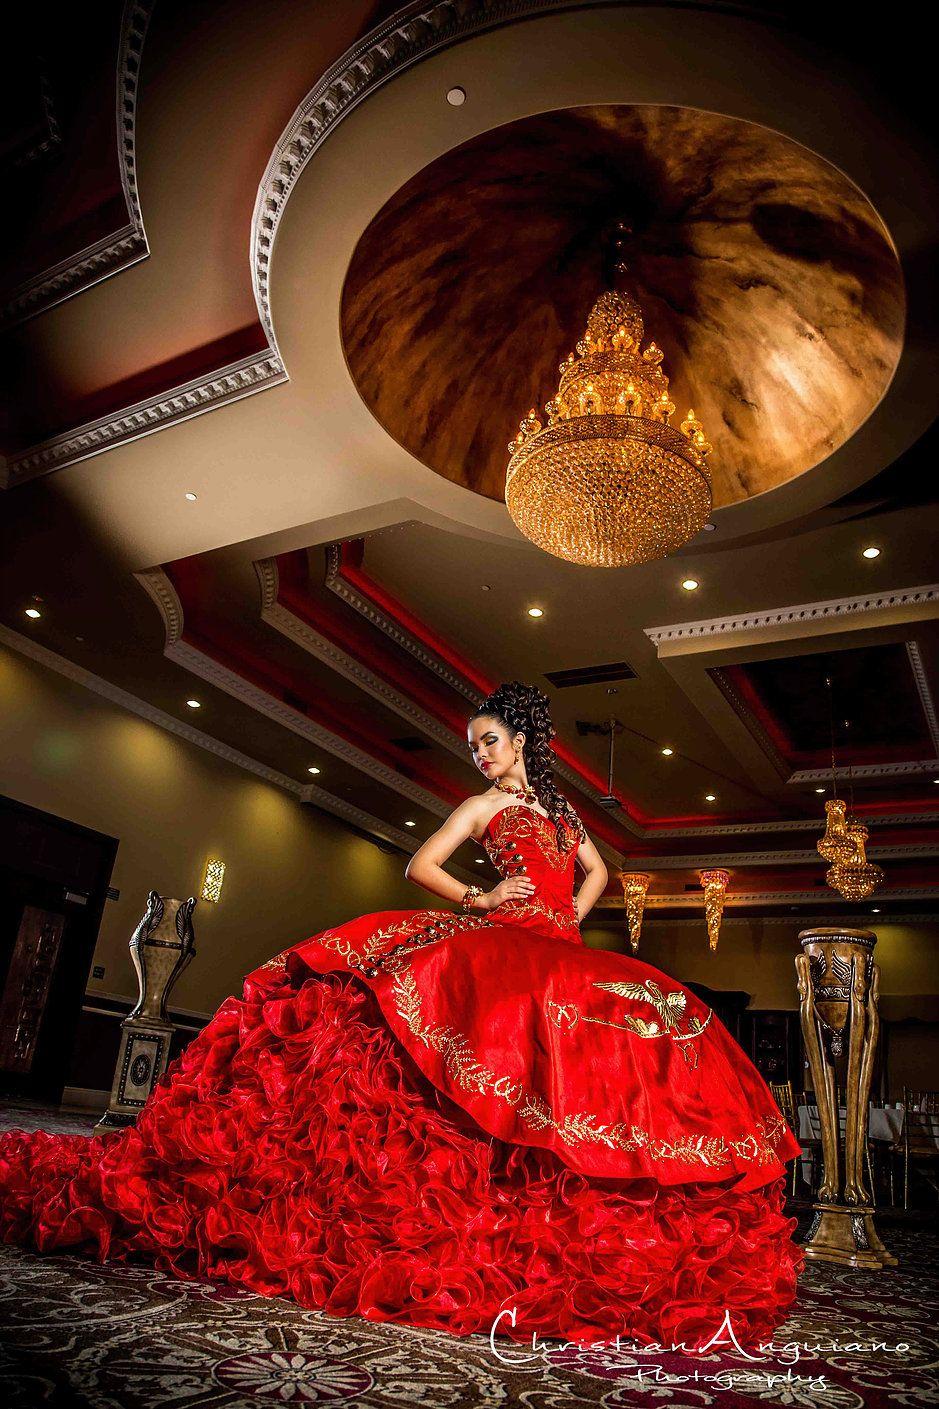 Quinceañera Dresses, Costum, Charro, Theme, Princess ...